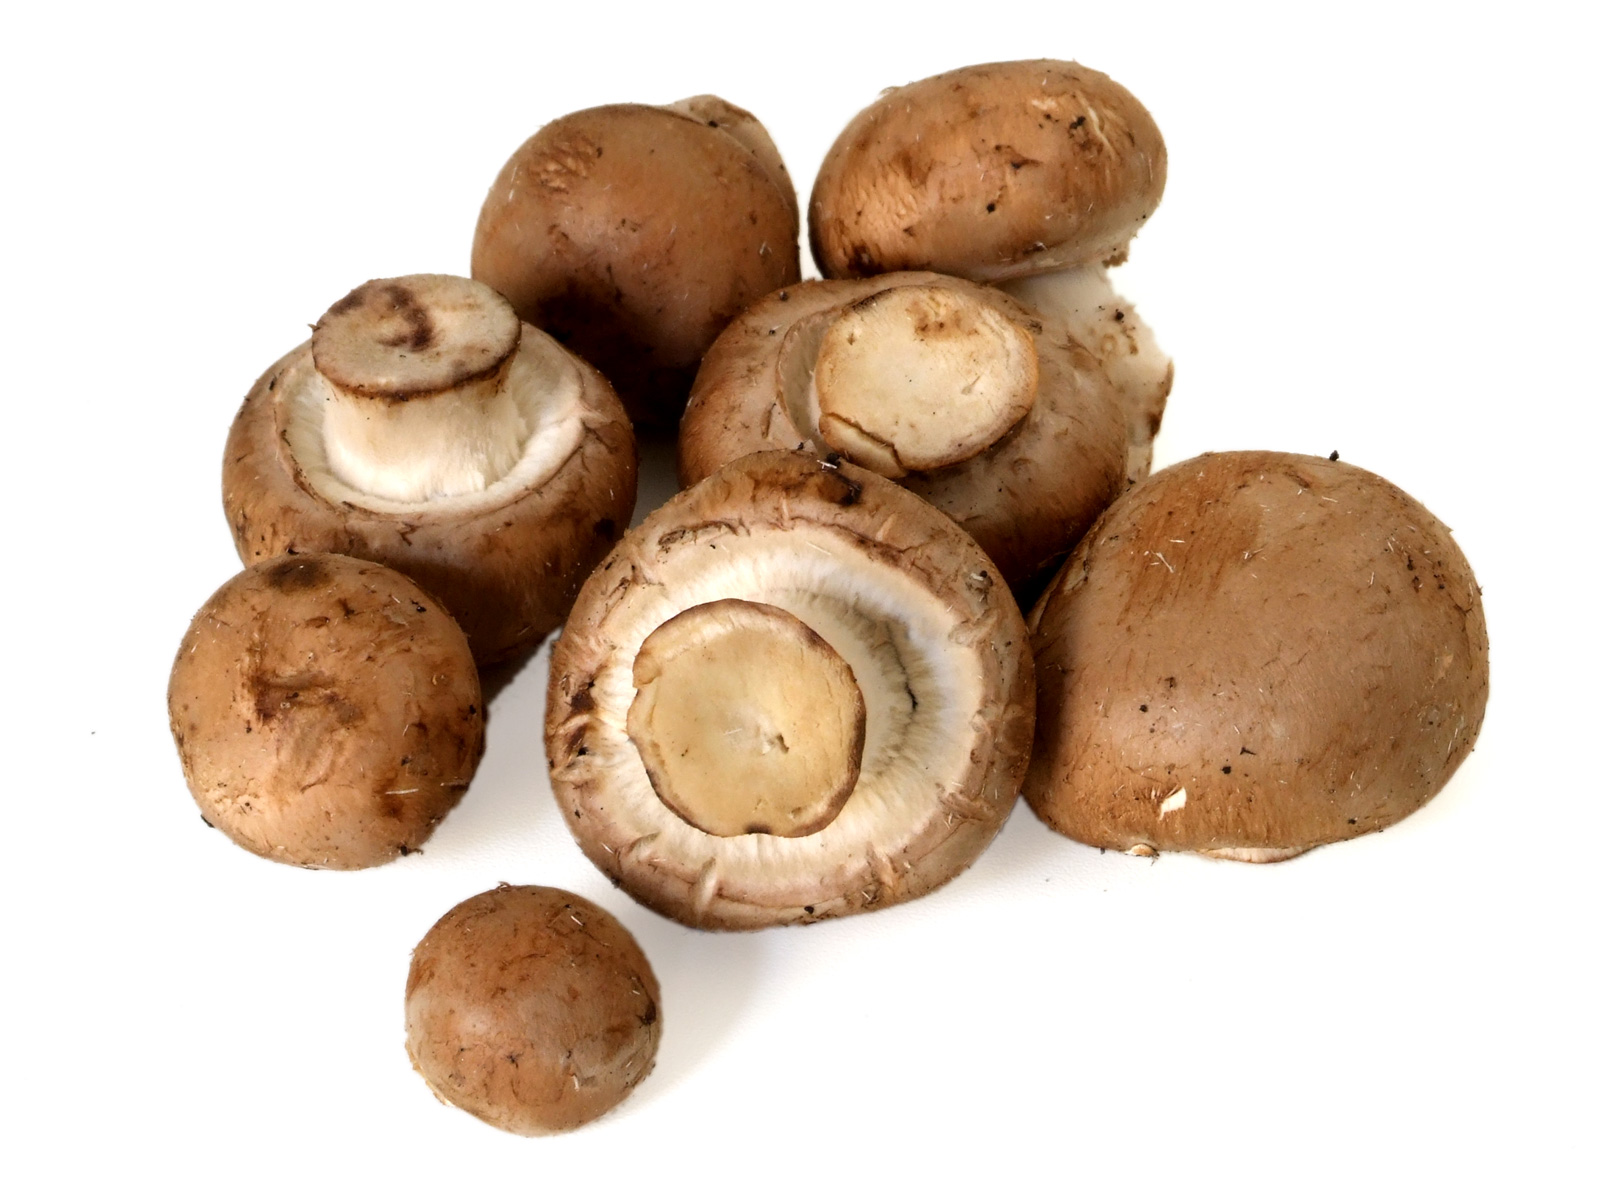 braun champignons pilze